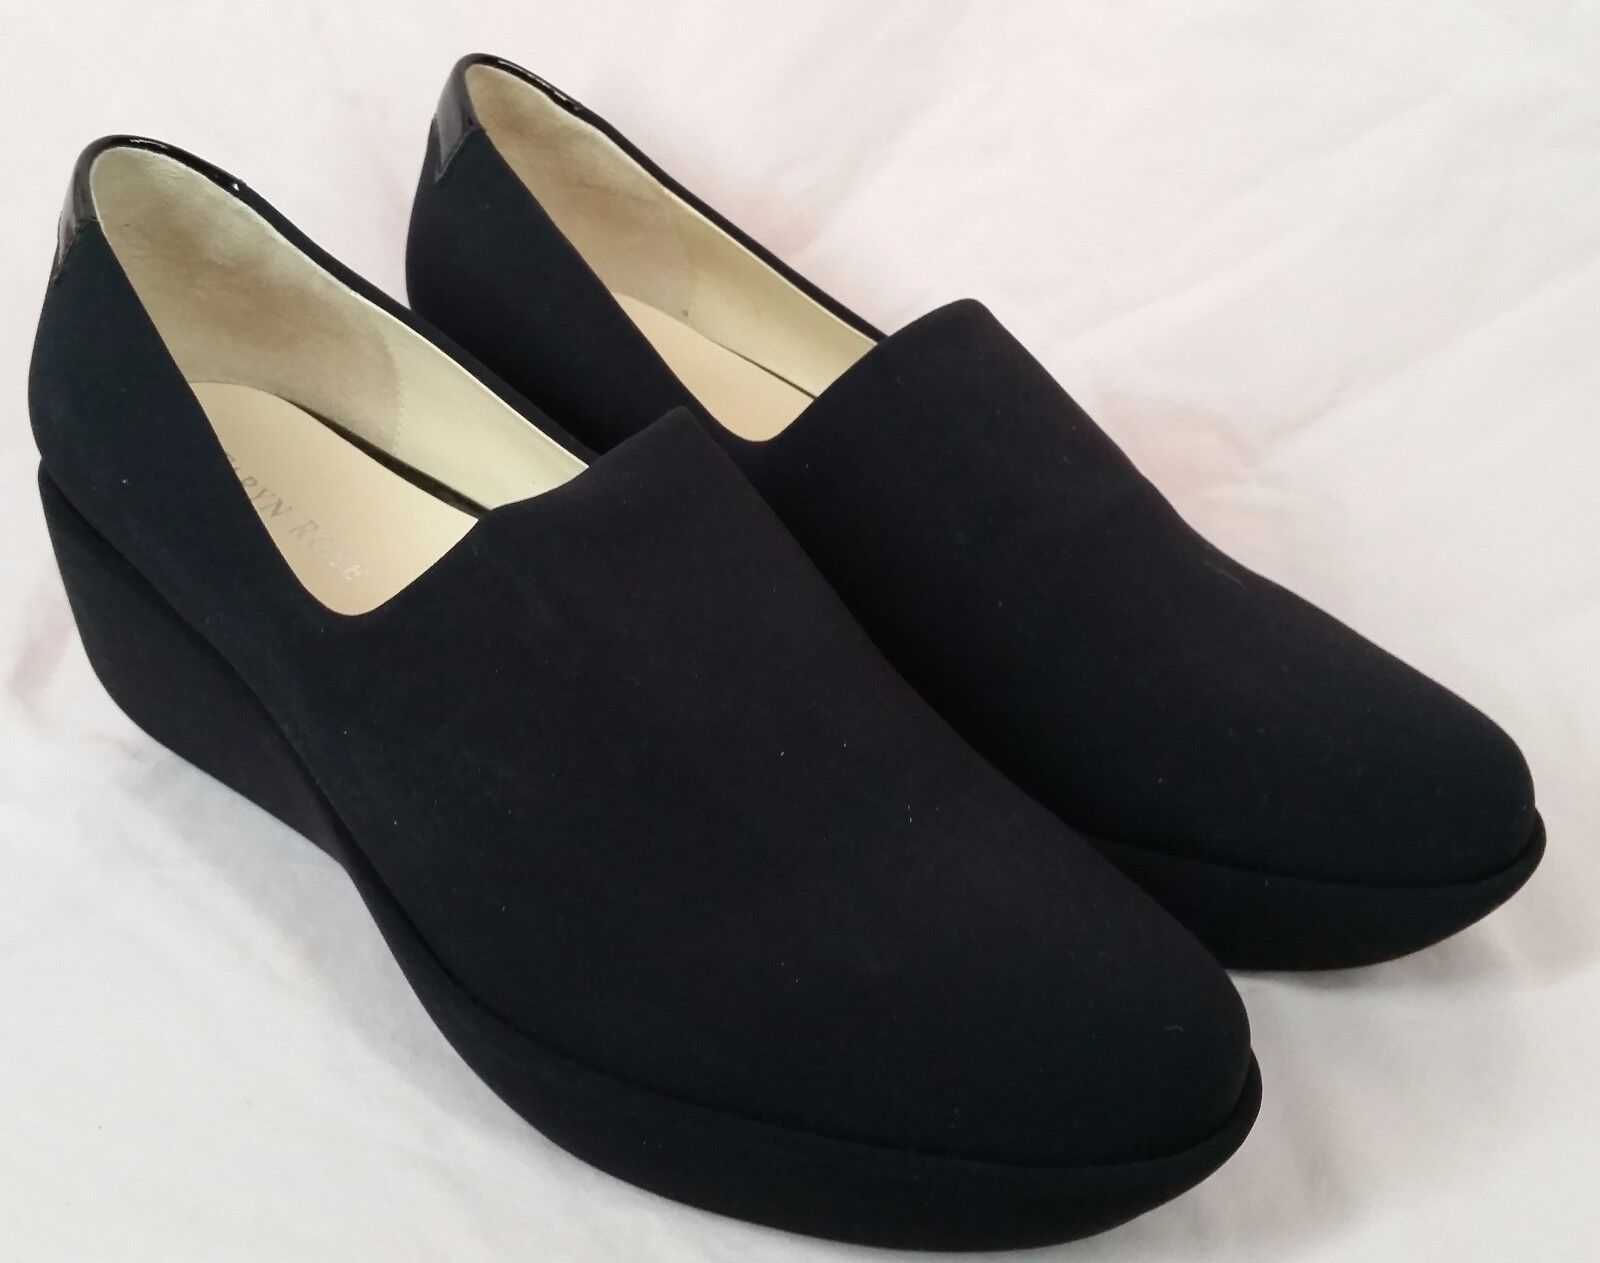 Taryn Rose Rose Taryn Women's 'Josephine' Basic Textile Casual Shoes black size 9.5 27b46f